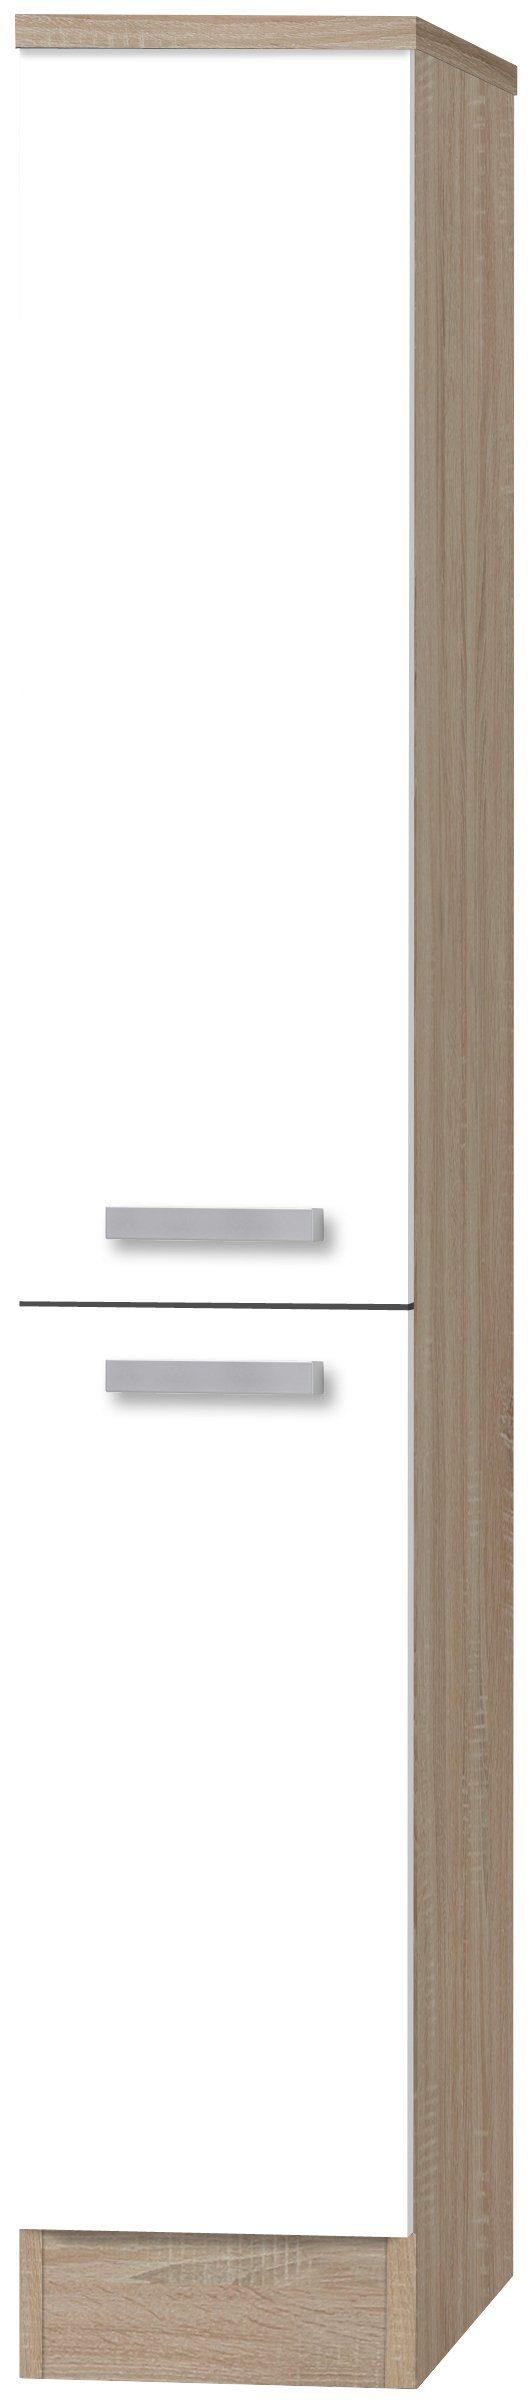 OPTIFIT Vorratsschrank »OPTIkult Zamora«, Breite 30 cm